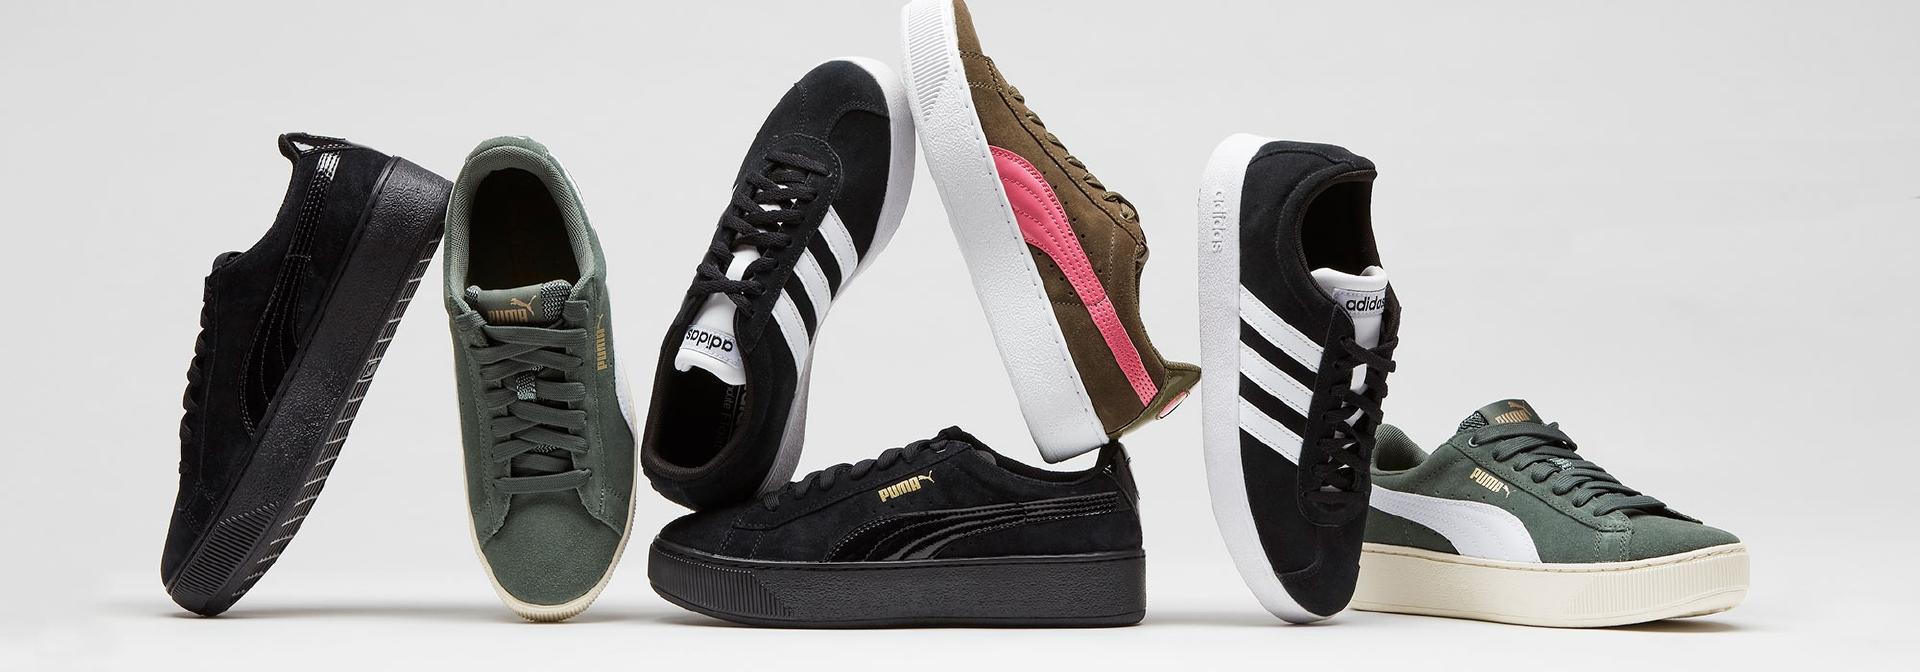 adidas - Neutral - Köp online hos Intersport 49883632e8a33